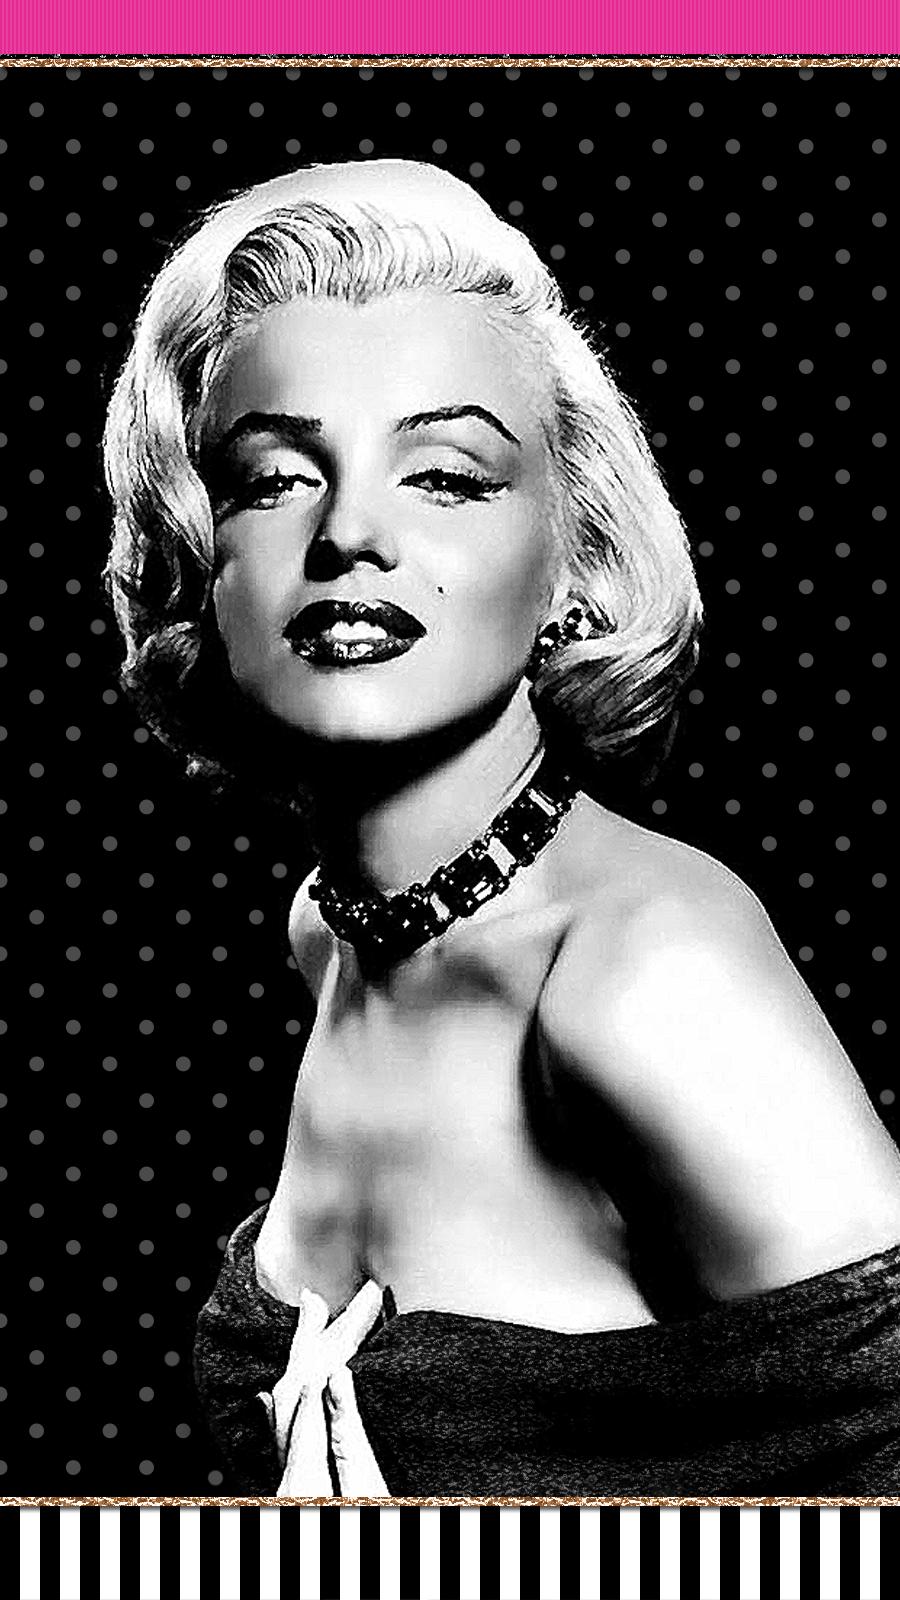 Cute Walls ♡: Marilyn Monroe wallpapers